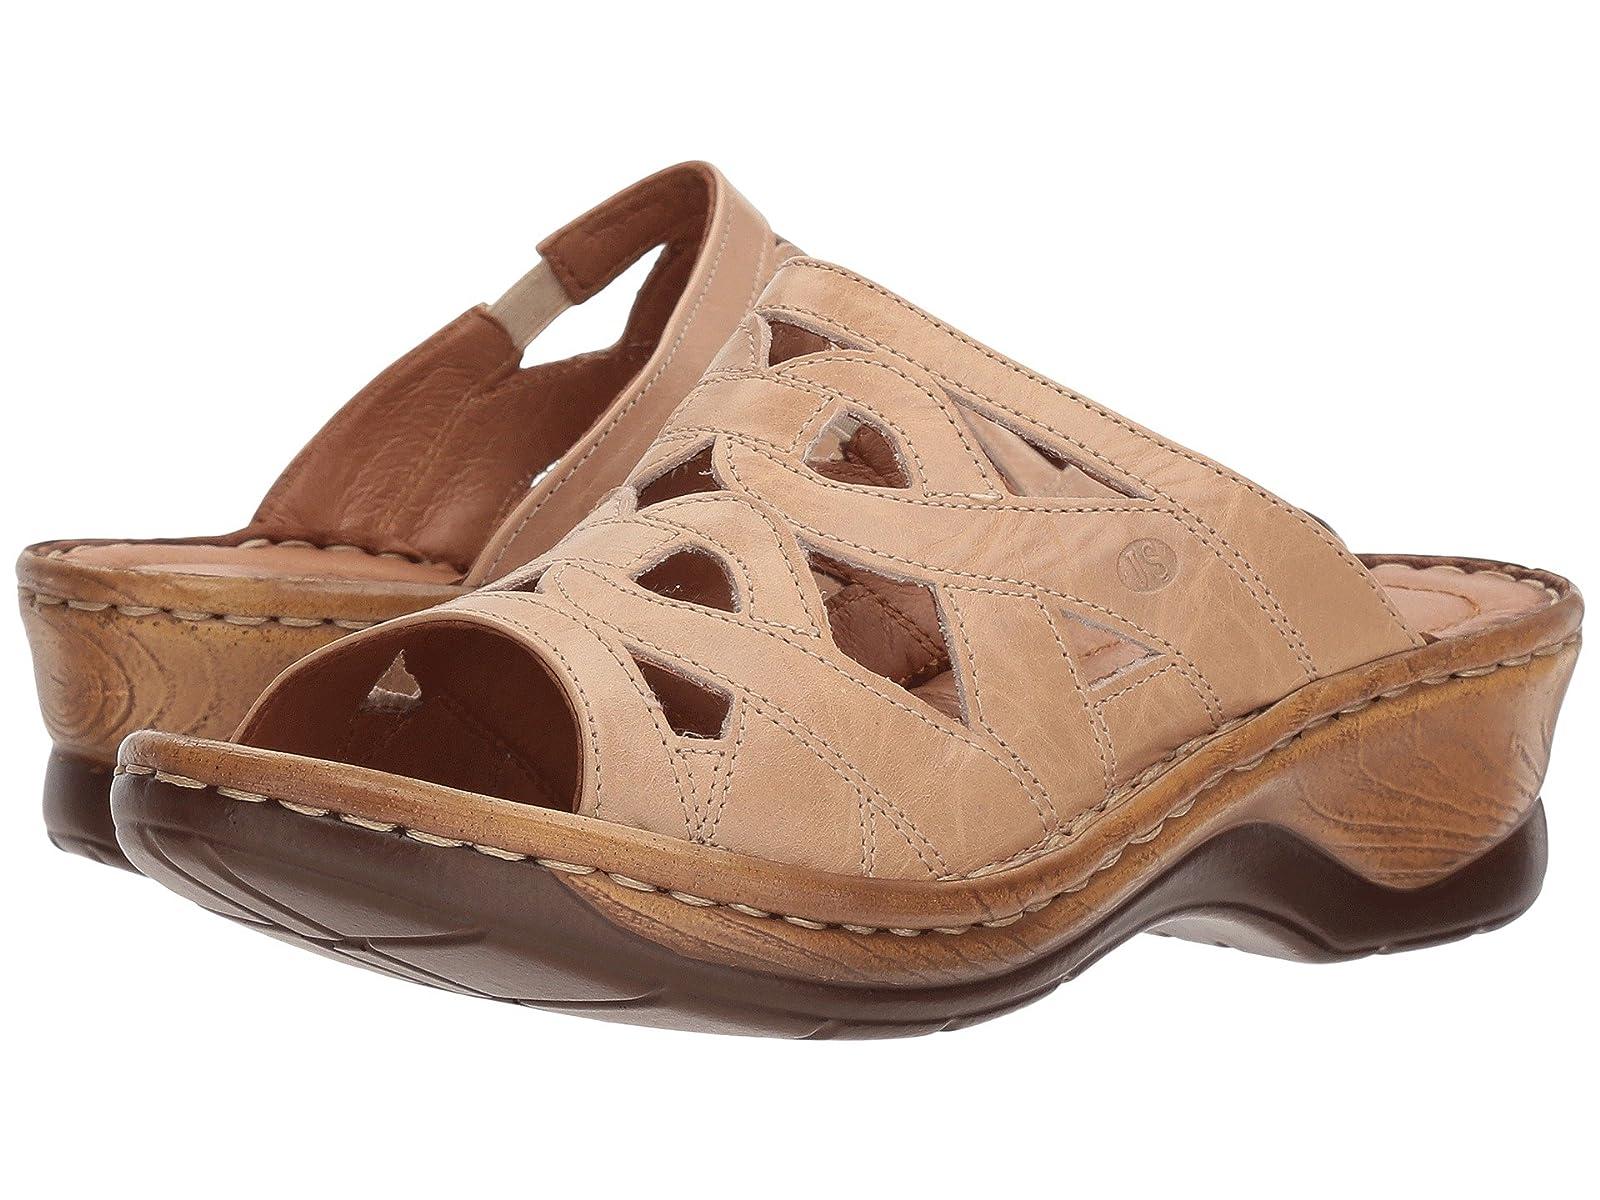 Josef Seibel Catalonia 44Atmospheric grades have affordable shoes